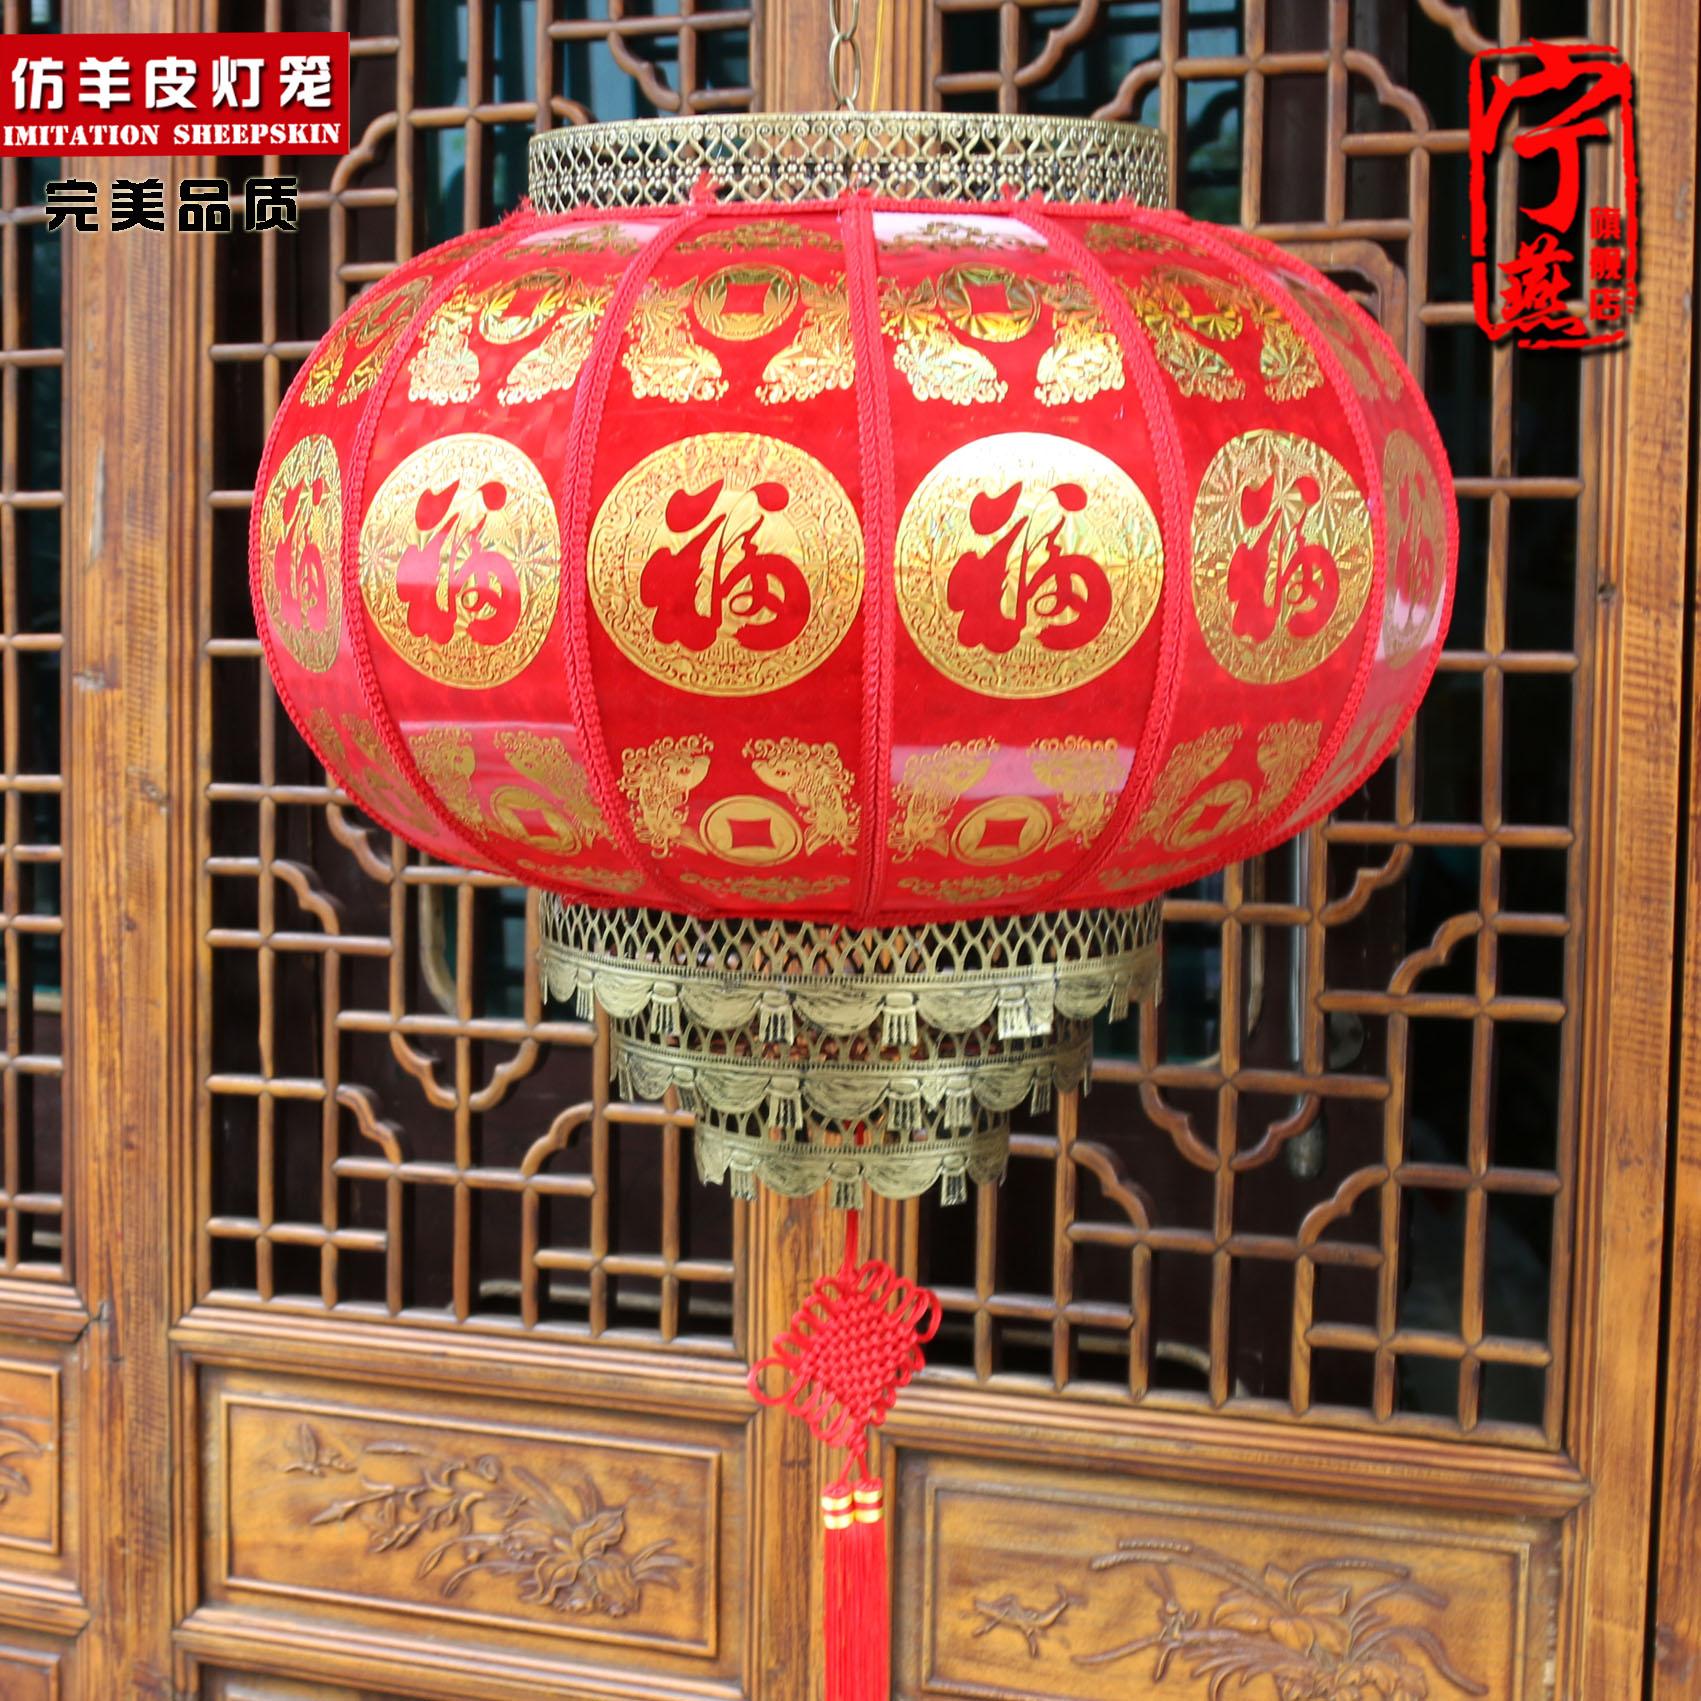 25 unique solar powered lanterns ideas on pinterest solar re